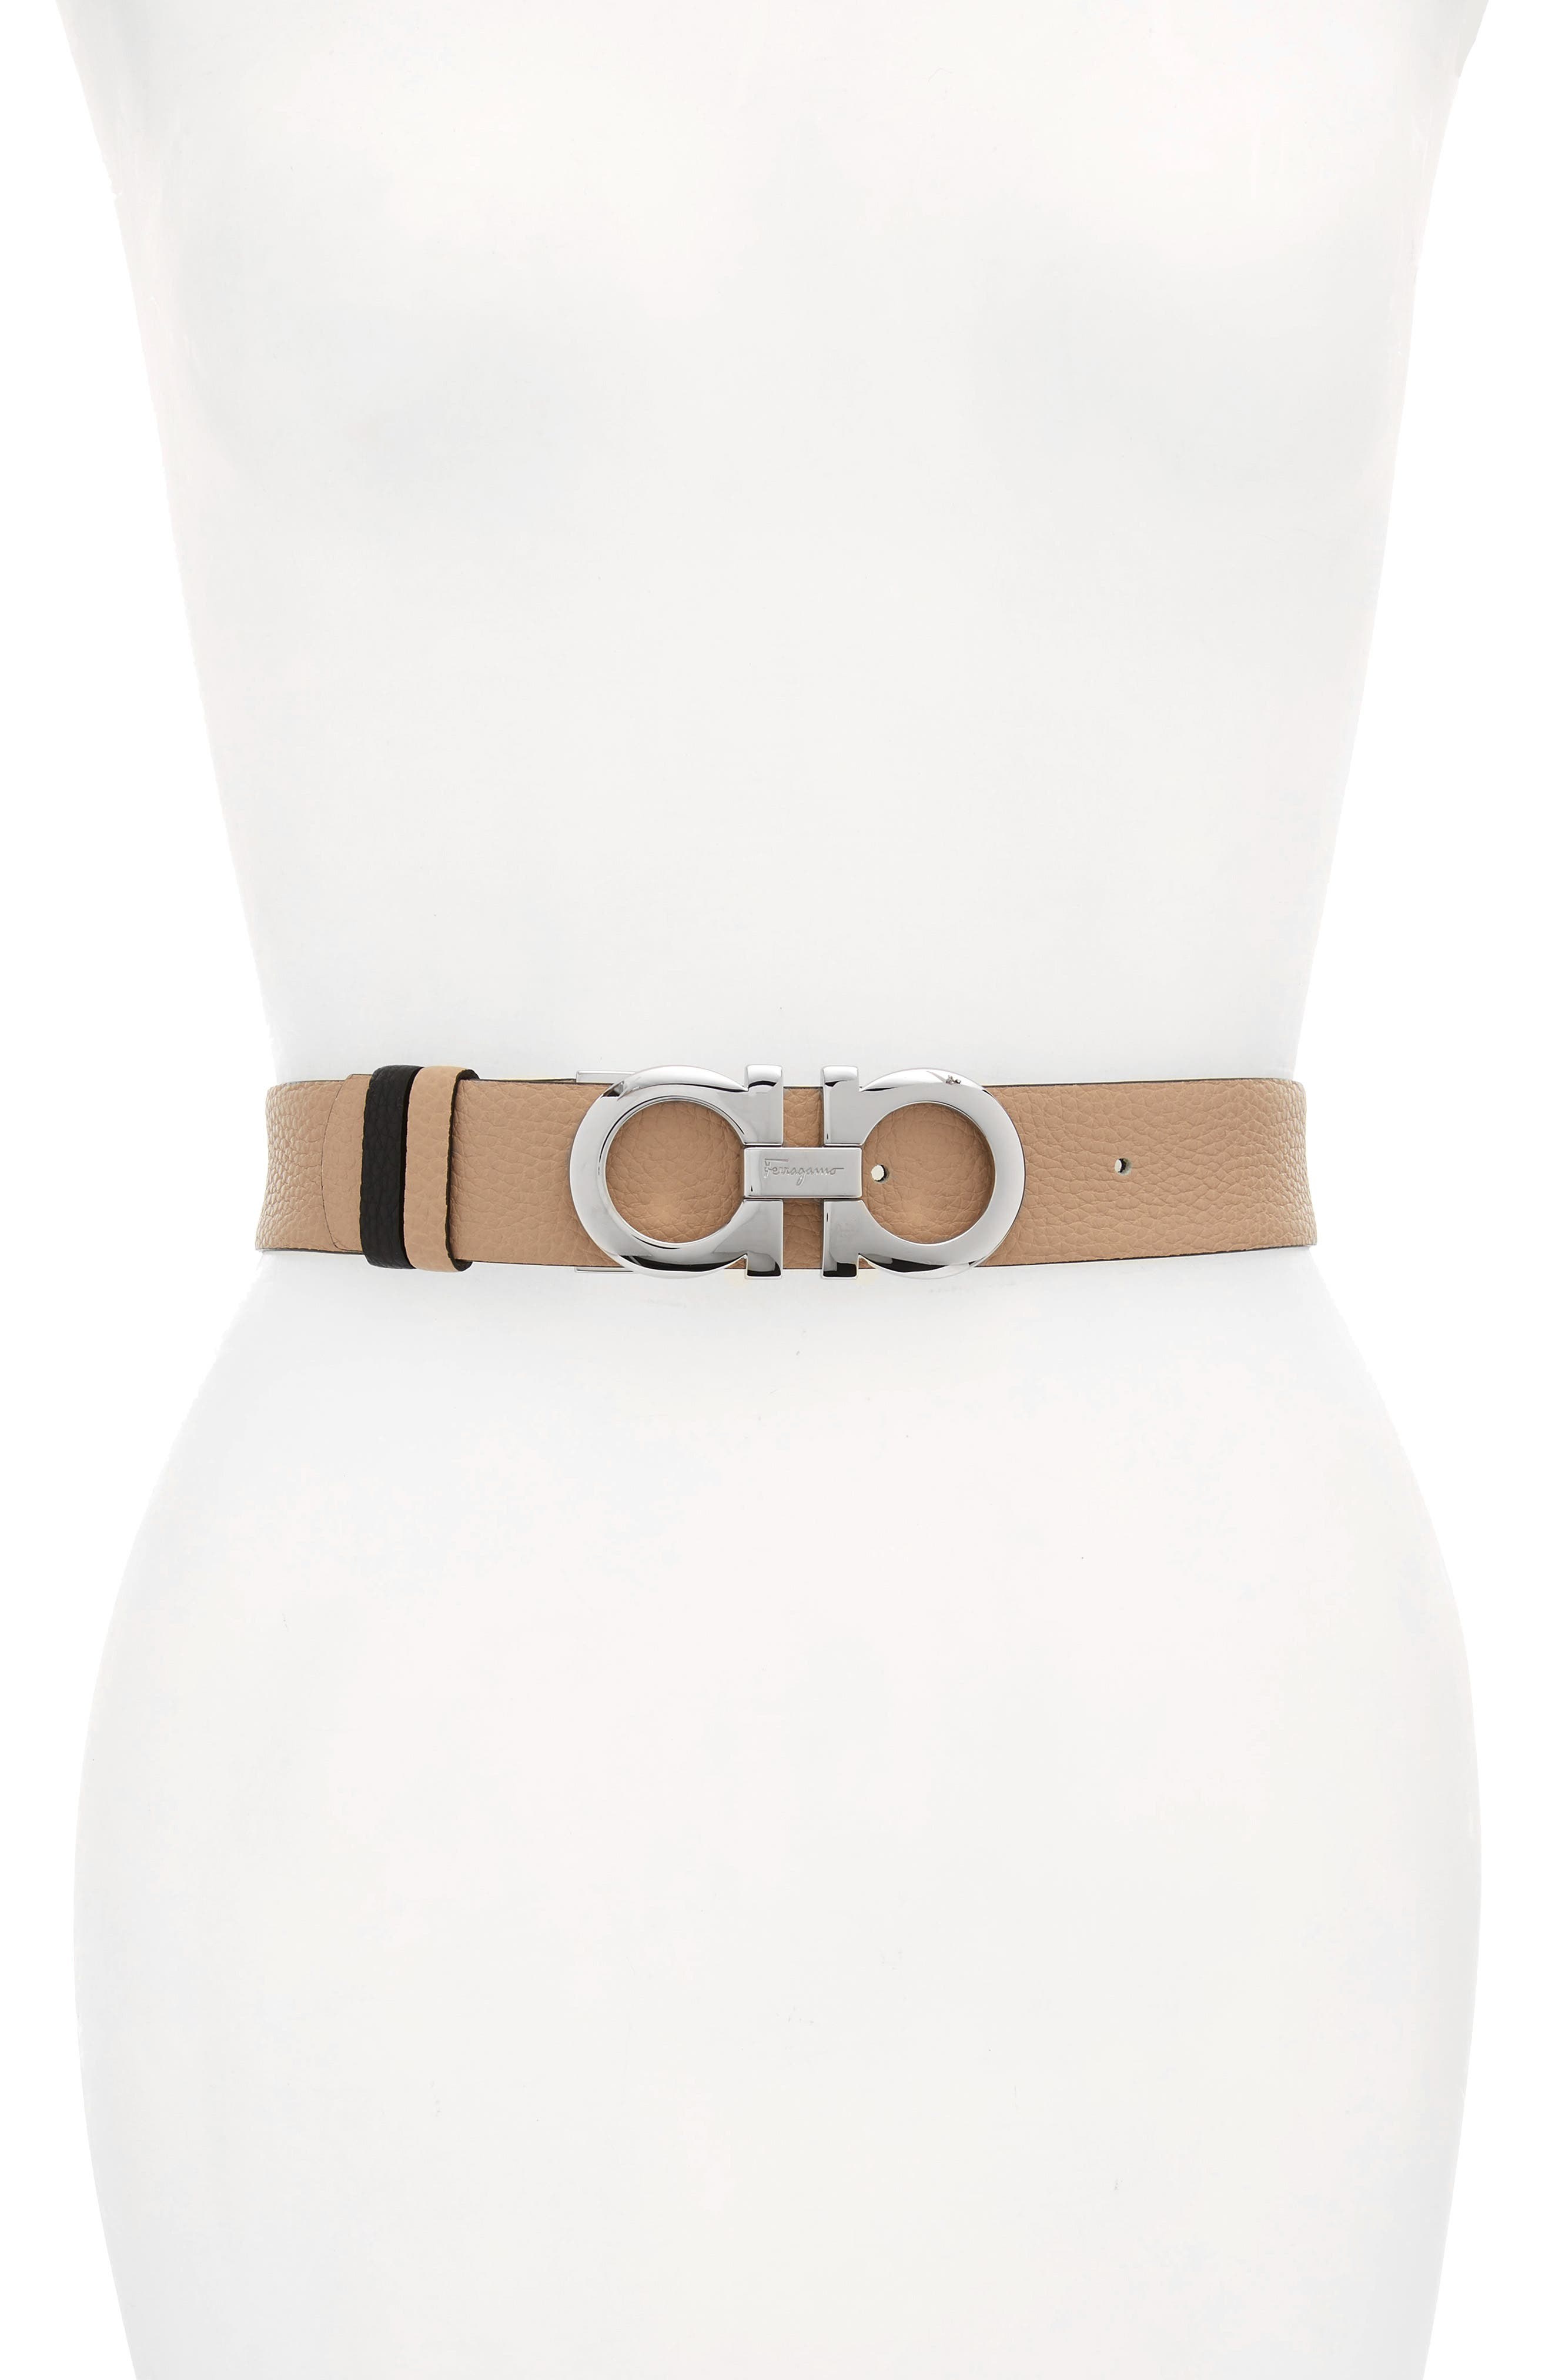 Salvatore Ferragamo Reversible Gancini Calfskin Leather Belt, New Bisque